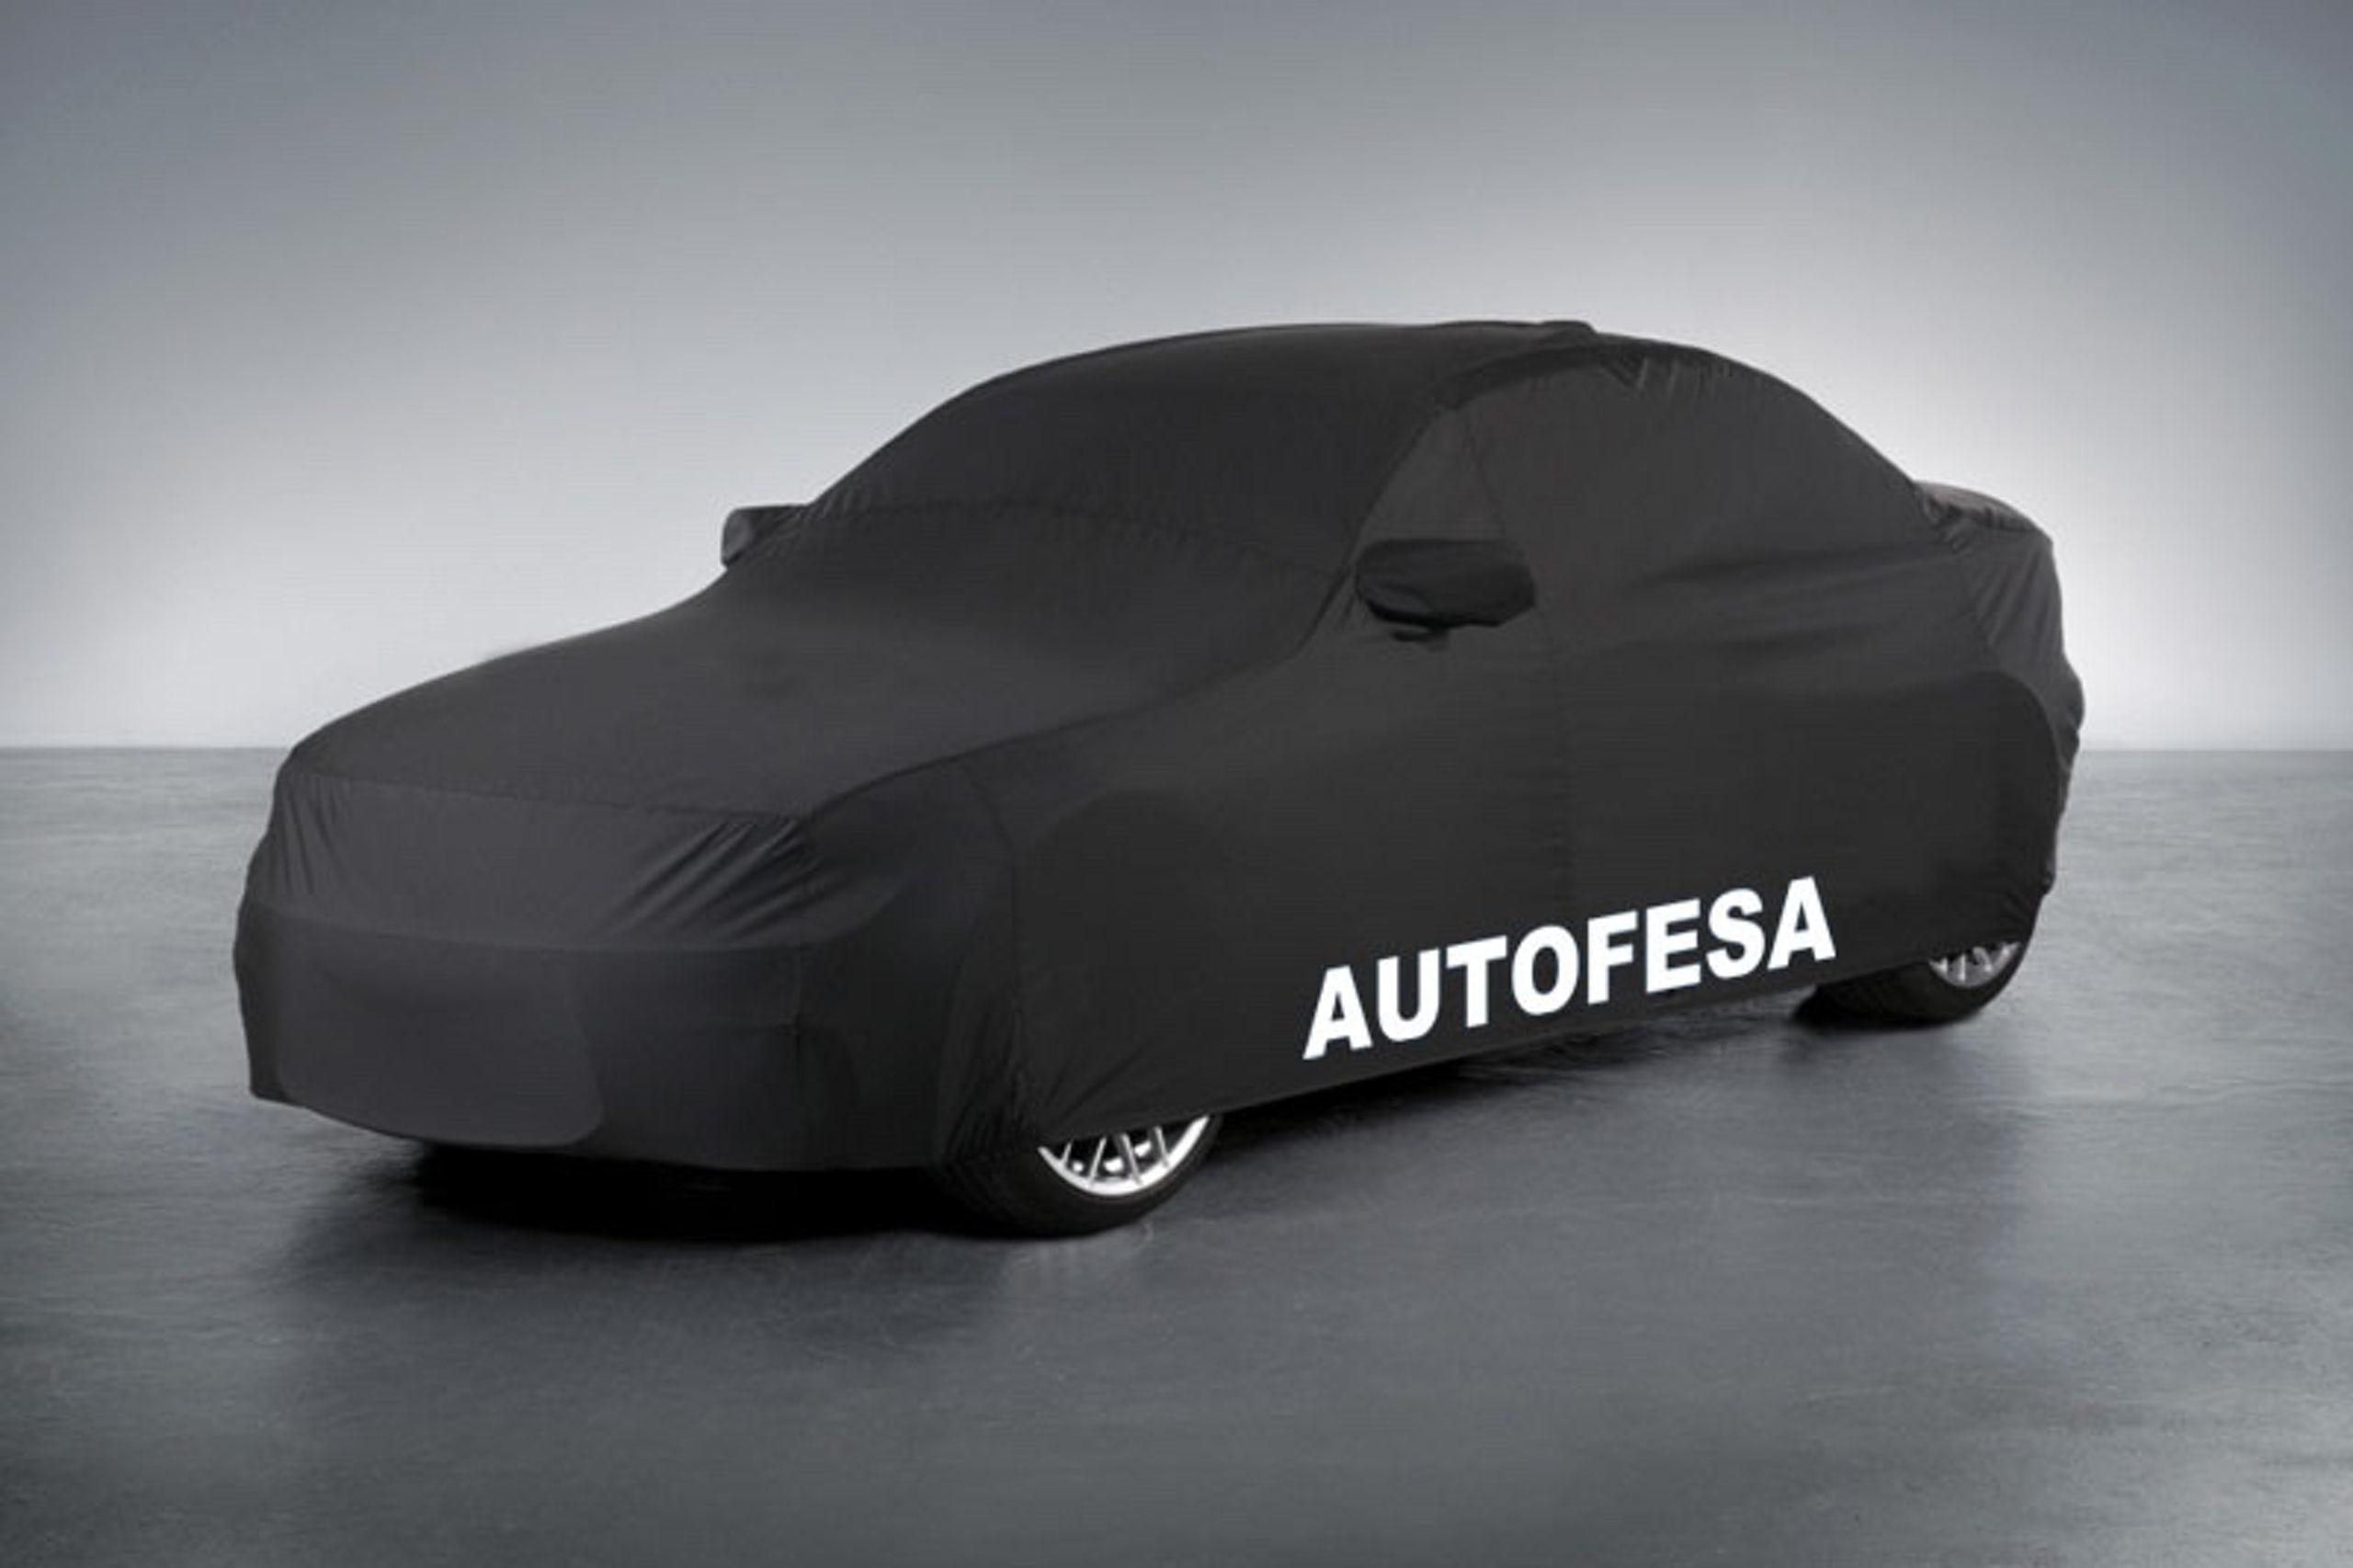 Audi A6 A6Avant COMPETITION ABT 3.0 TDI V6 T 326cv quattro 5p S tronic 4x4 Cpmpetition ABT S/S - Foto 33